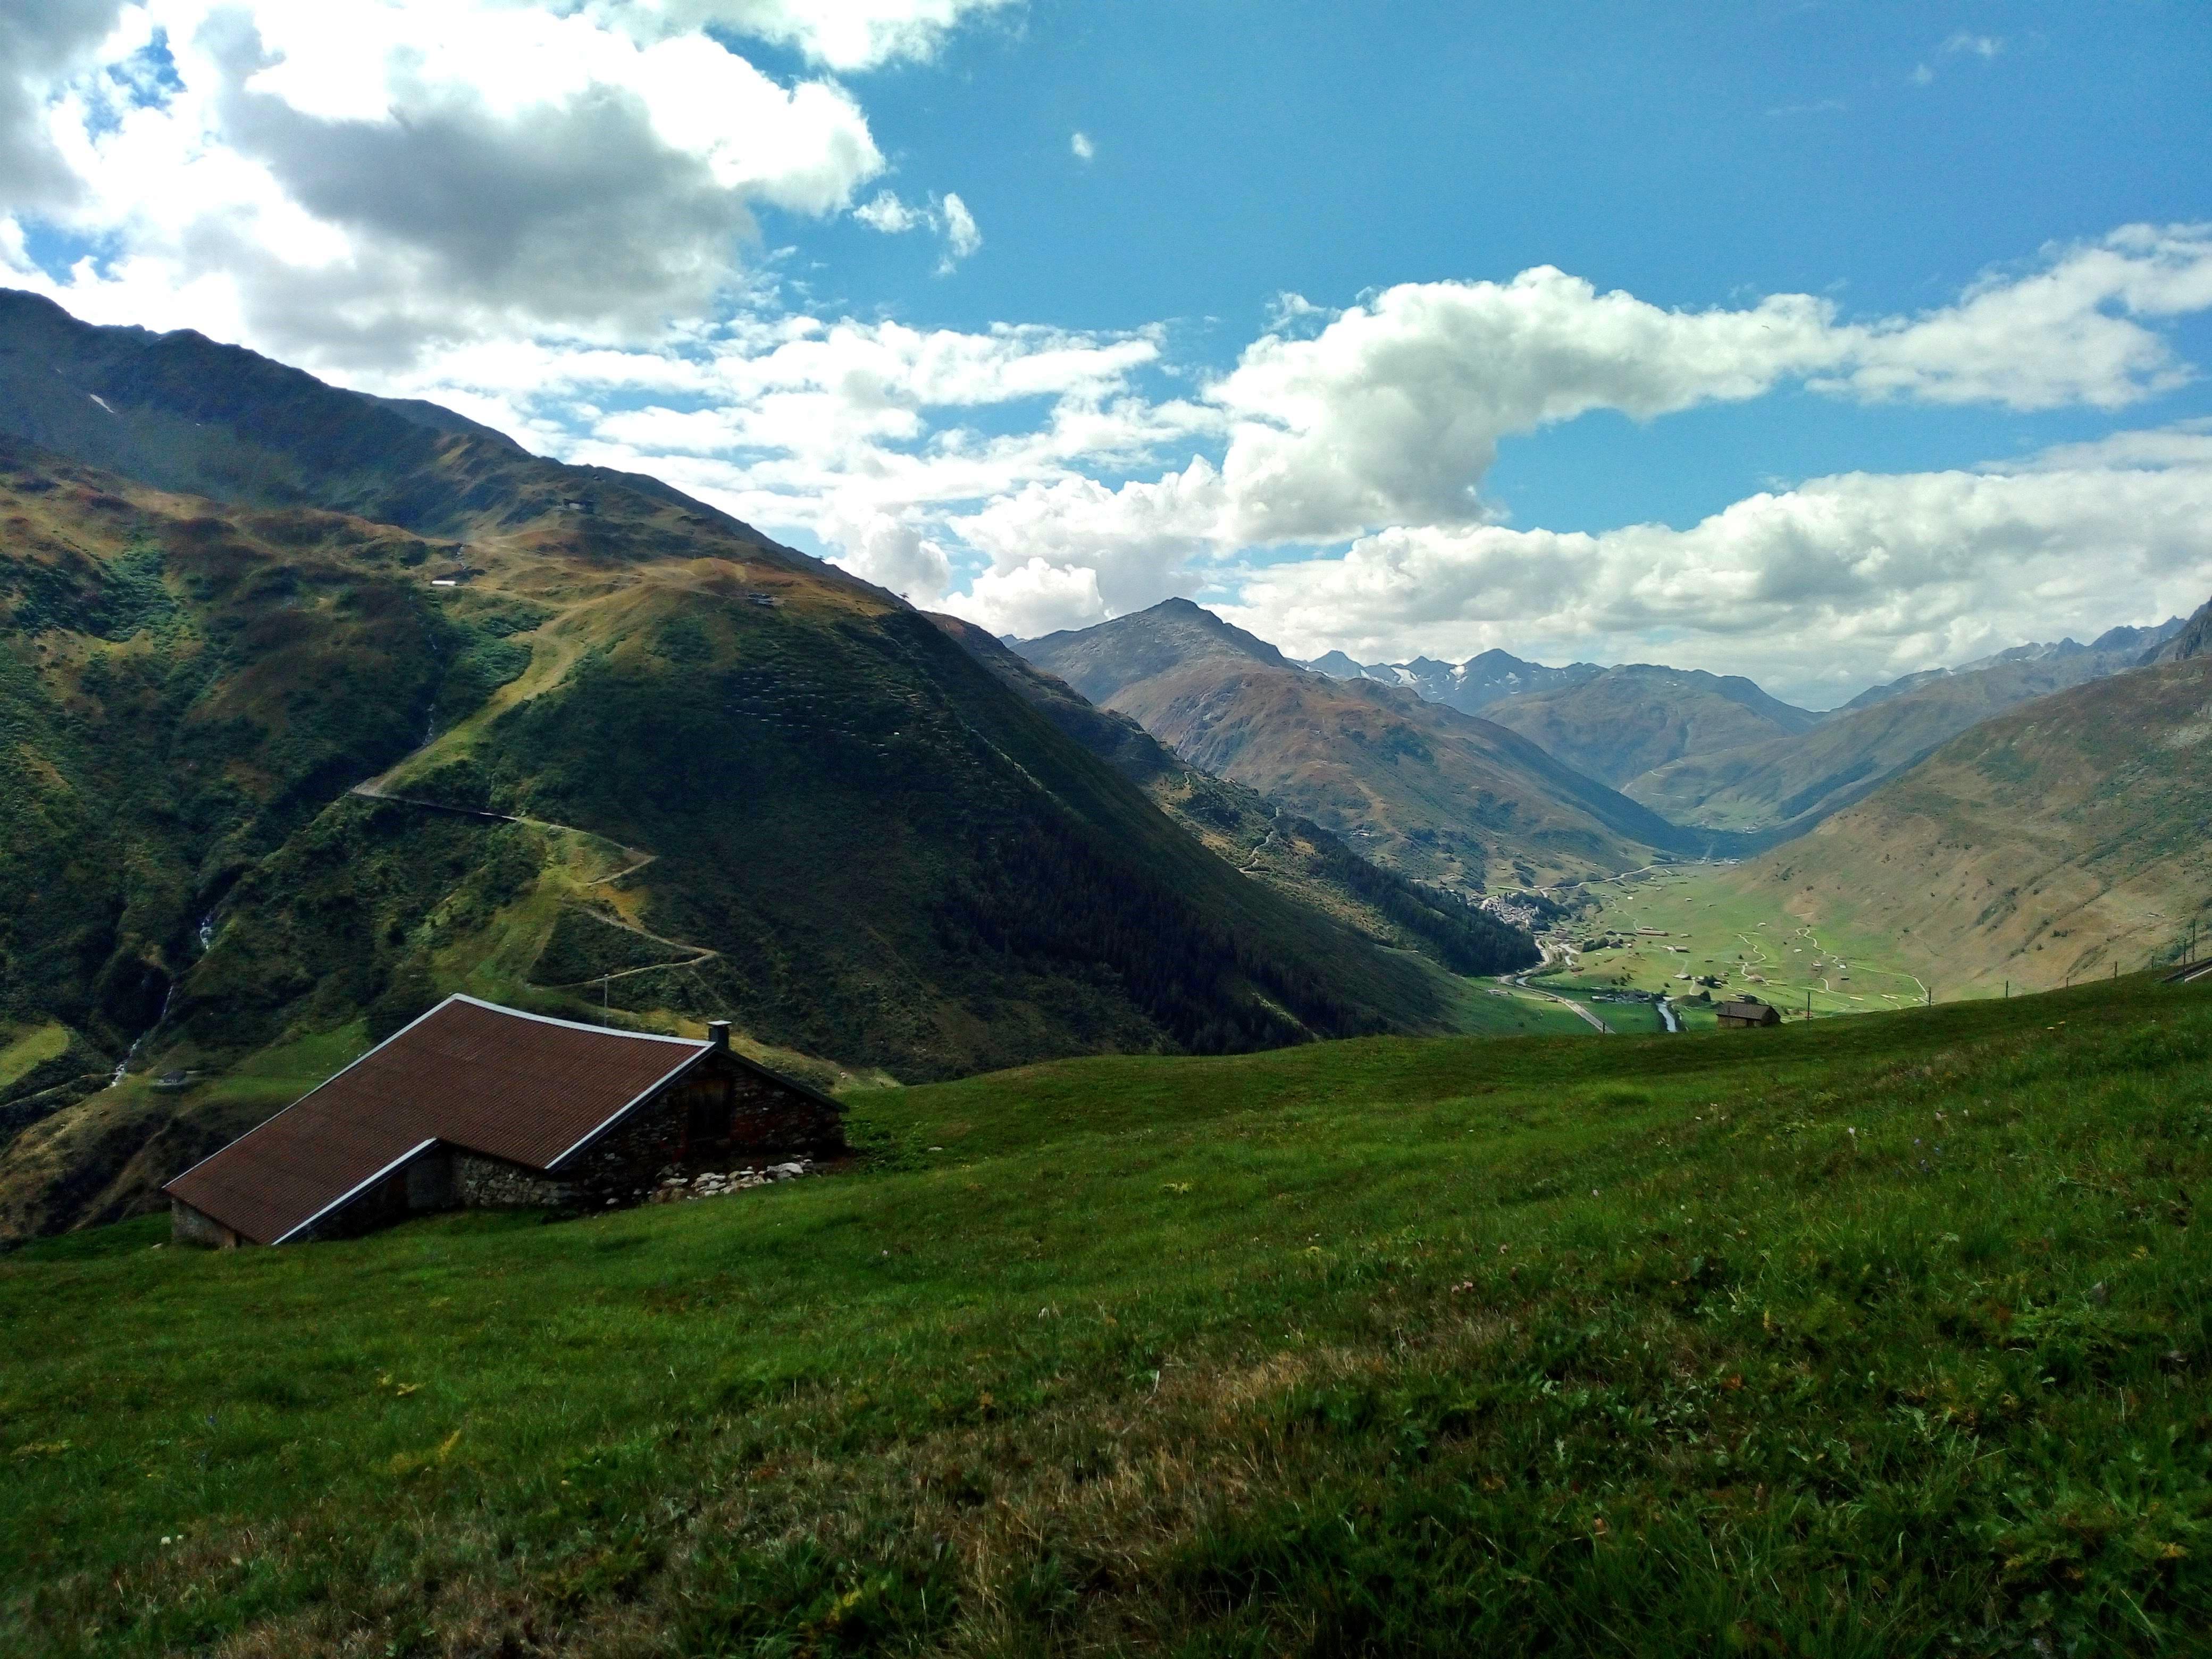 Landschaftliche Idylle am Oberalppass